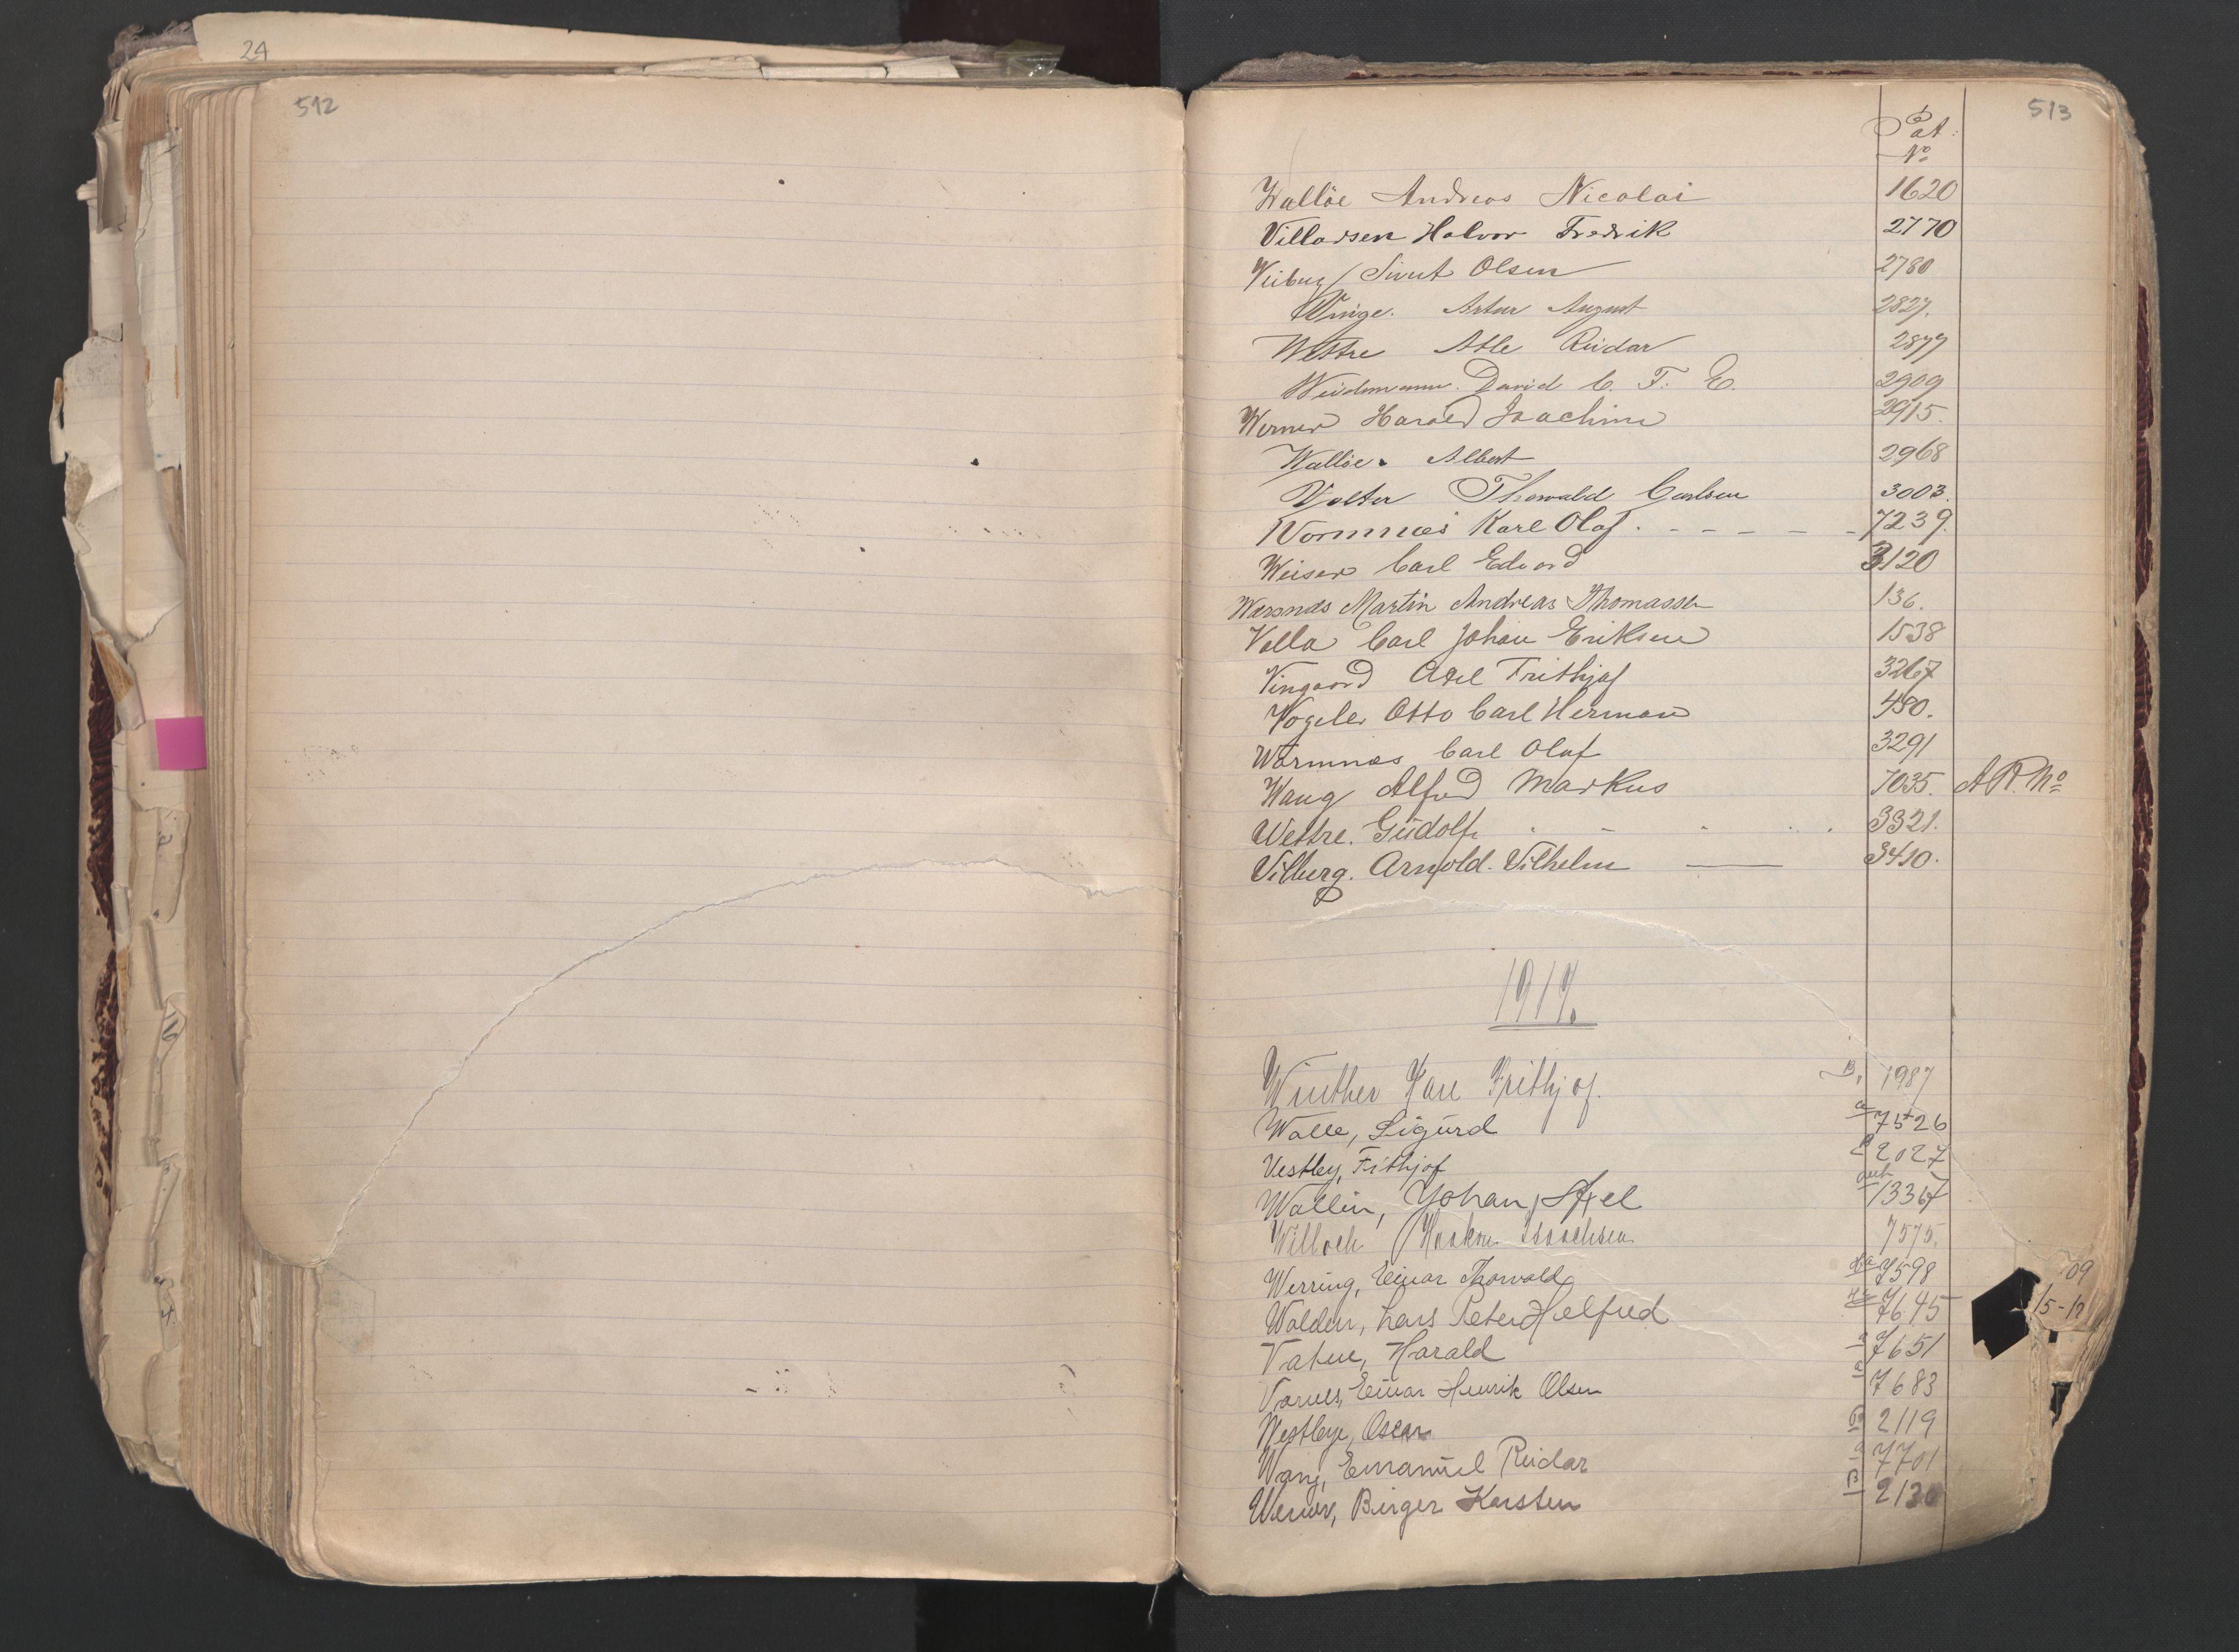 SAO, Oslo sjømannskontor, F/Fa/L0003: Register for Oslo mønstringskrets, 1891-1948, s. 512-513